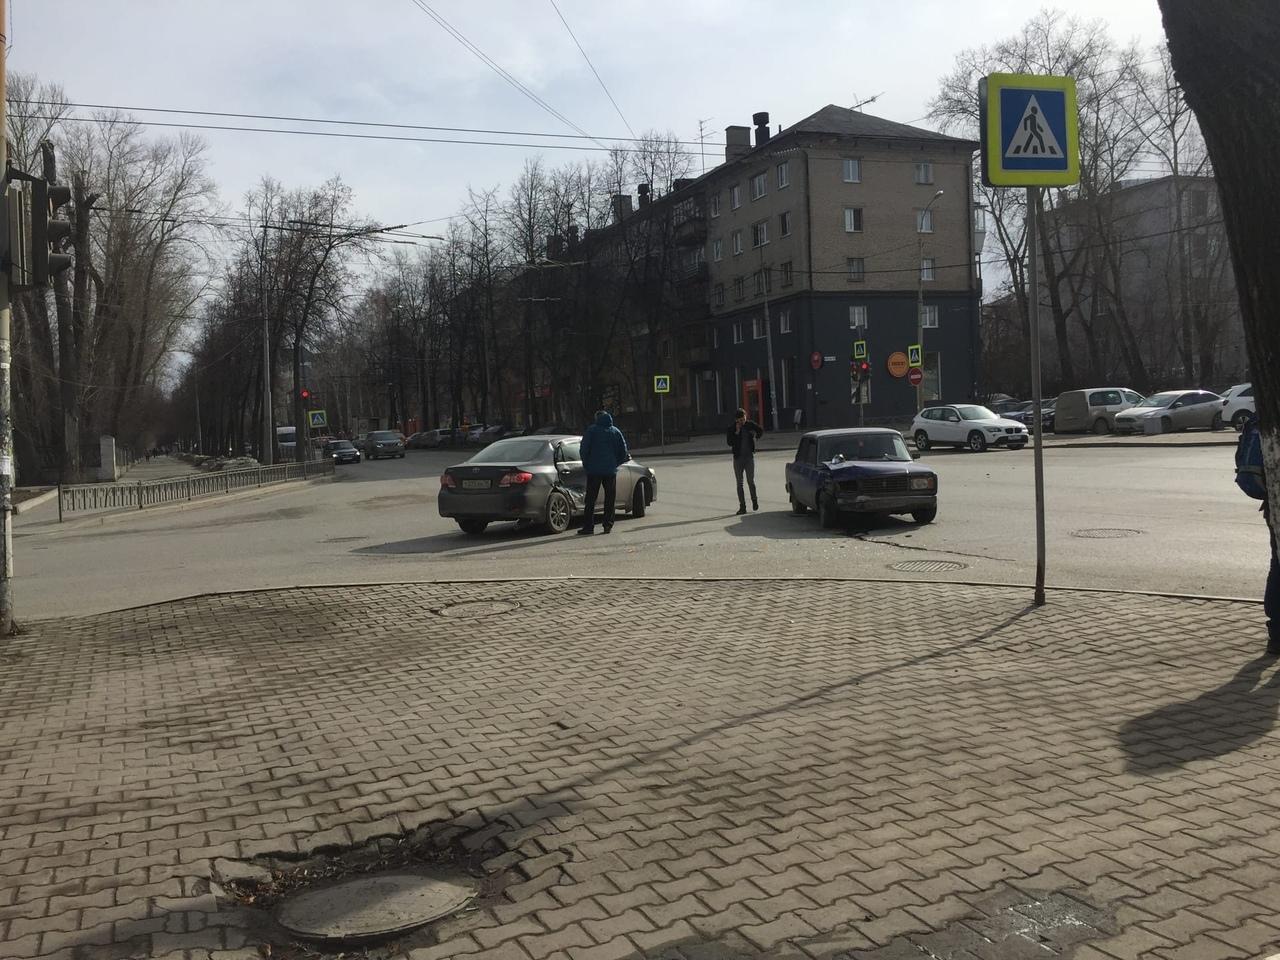 Около института МЧС в Екатеринбурге «семерка» протаранила иномарку